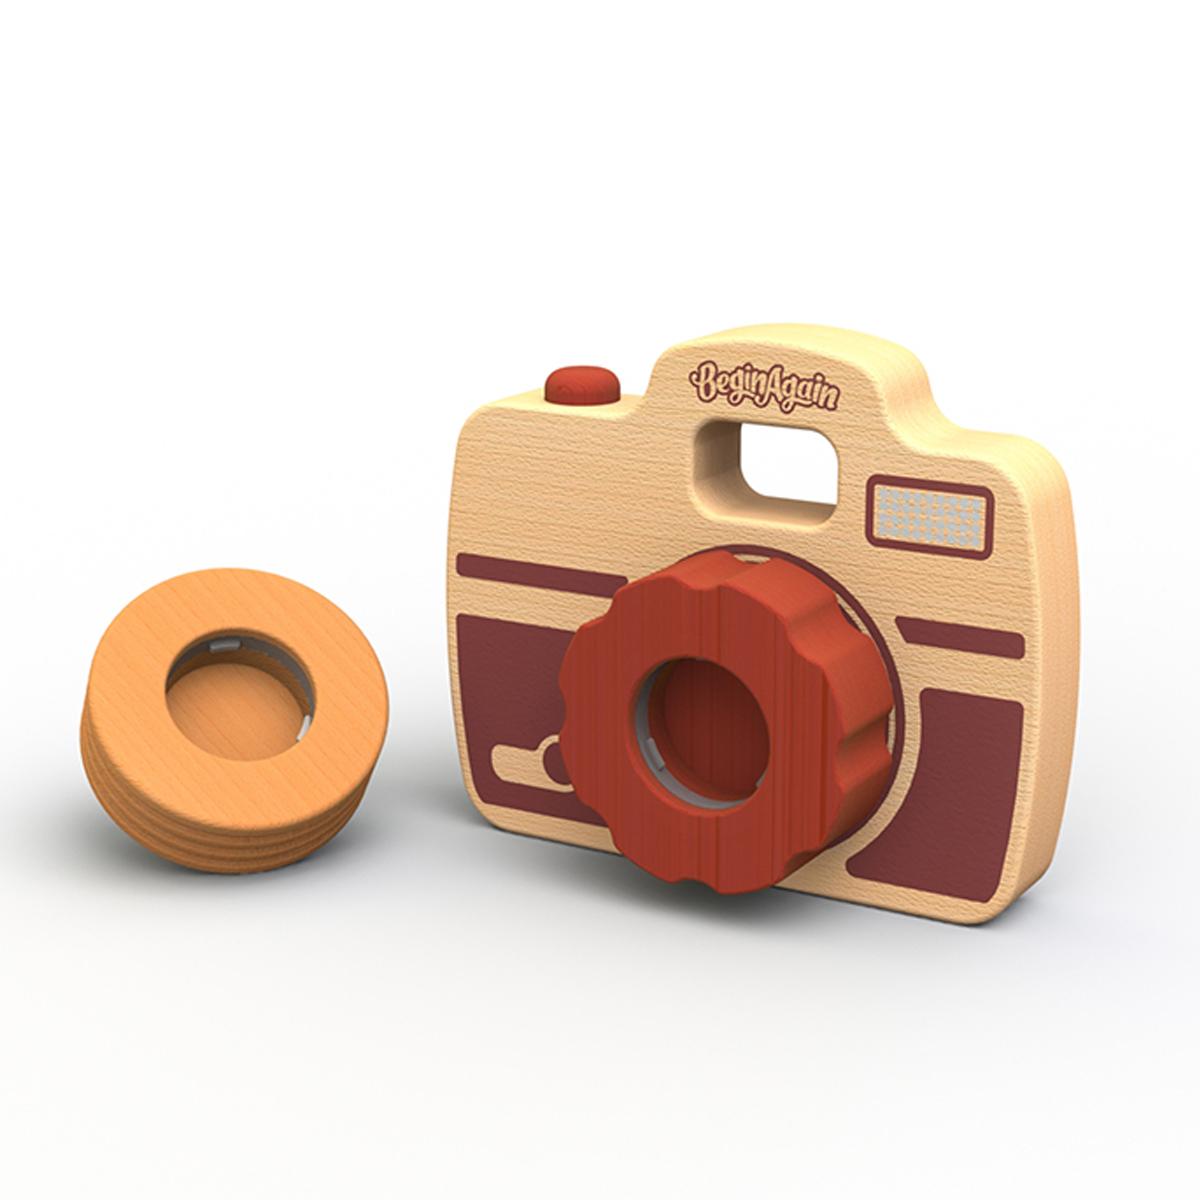 ShutterbugCamera-8-SQUARE.jpg